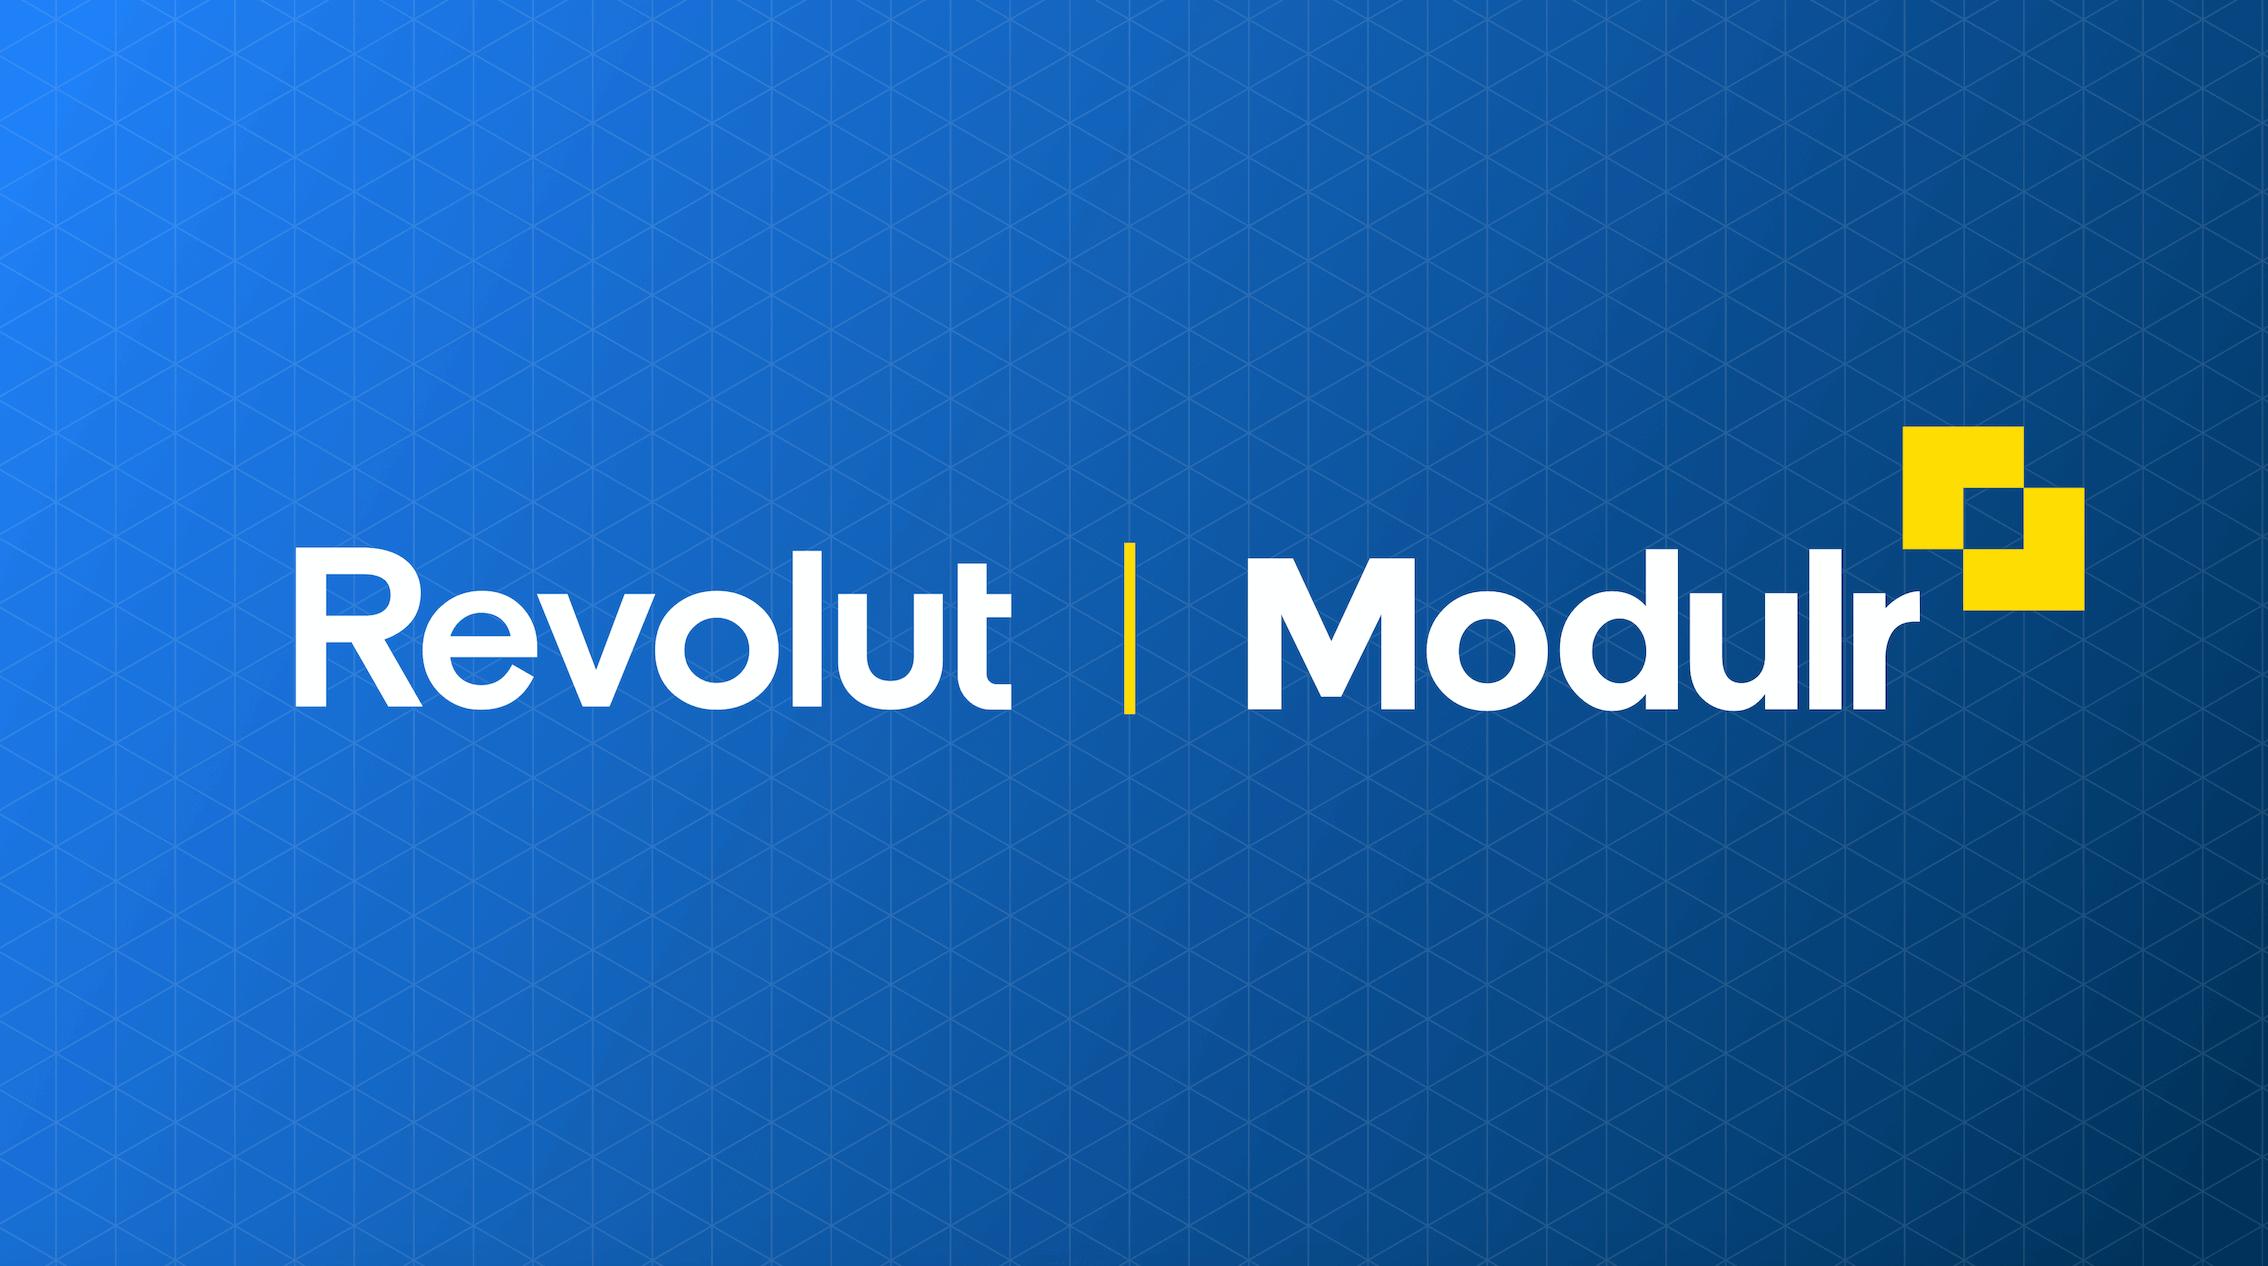 revolut-modulr